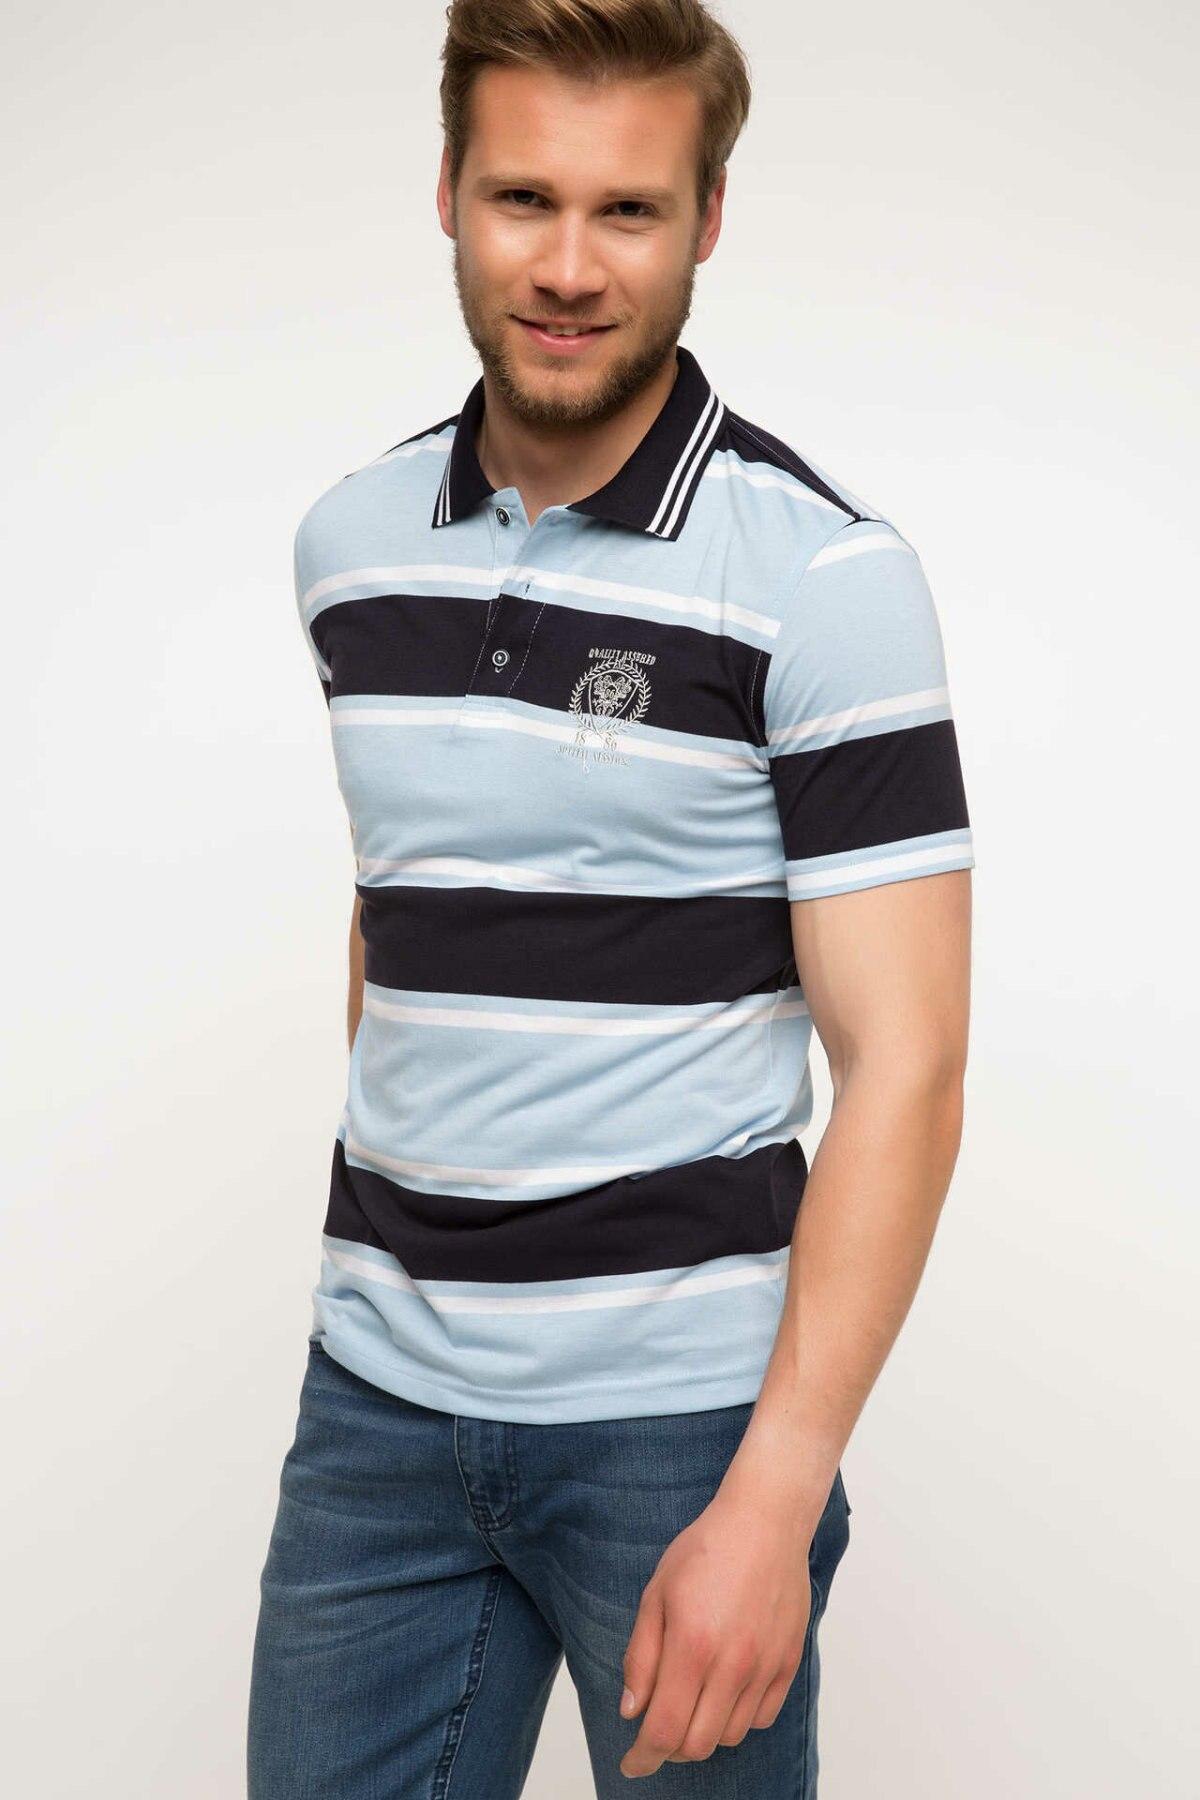 DeFacto Men Summer Polo Shirt Casual Striped Cotton Short Sleeve Polo Shirts Male Simple Breathable Tops Tee -G9141AZ17SM-G9141AZ17SM